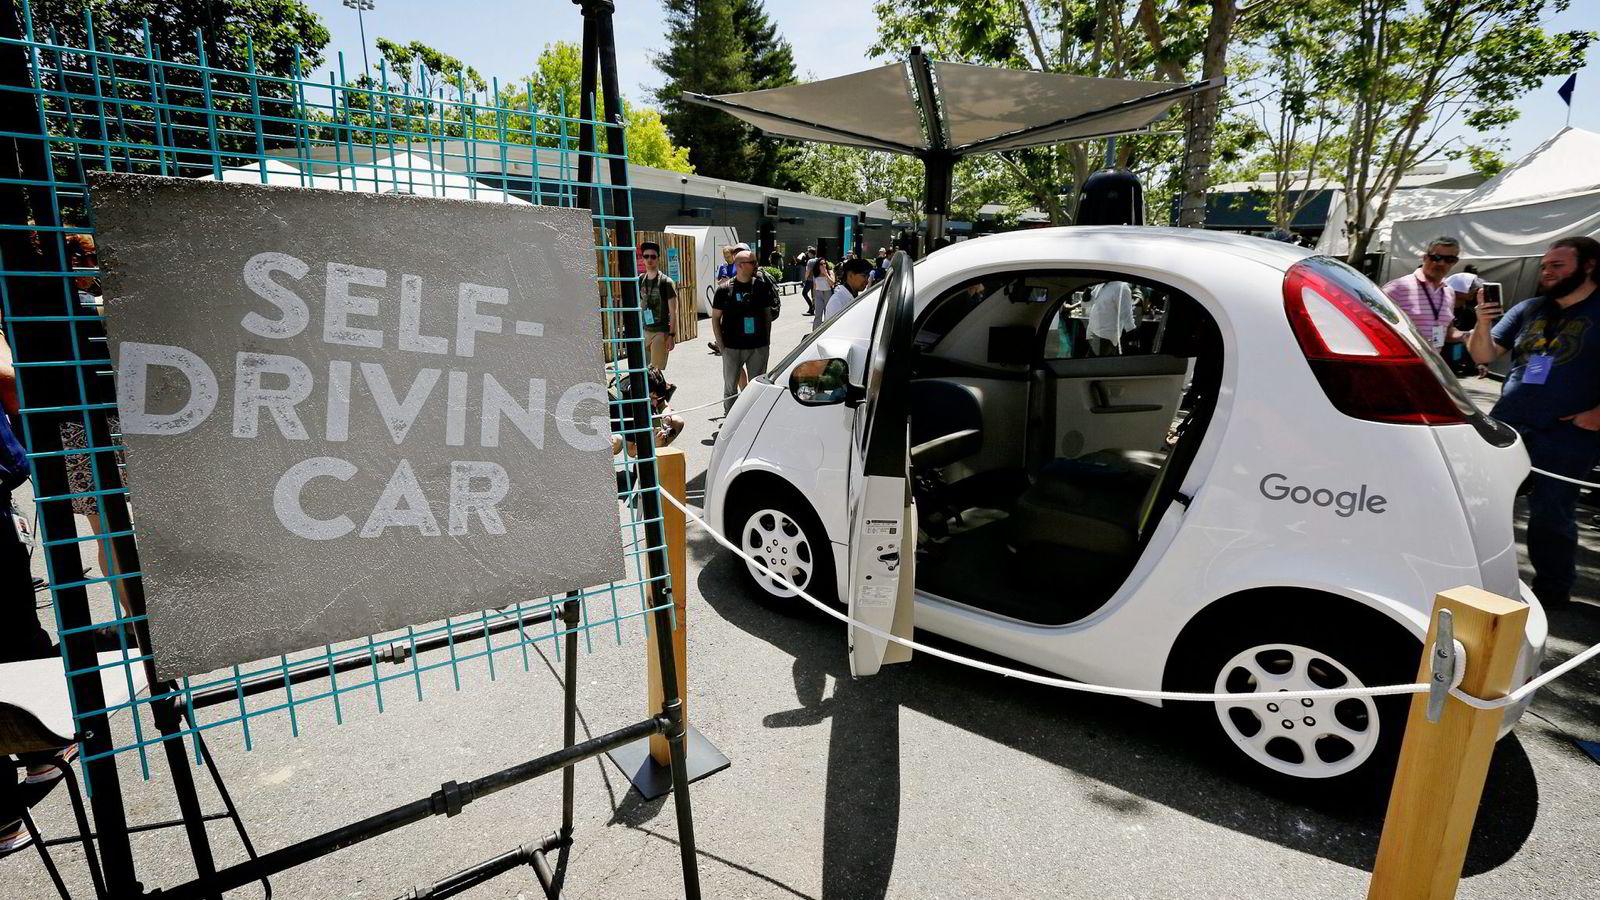 Førerløse biler vil by på moralske problemer når den skal programmeres for valg i ulykkessituasjoner. Foto: Eric Risberg/Ap/NTB Scanpix